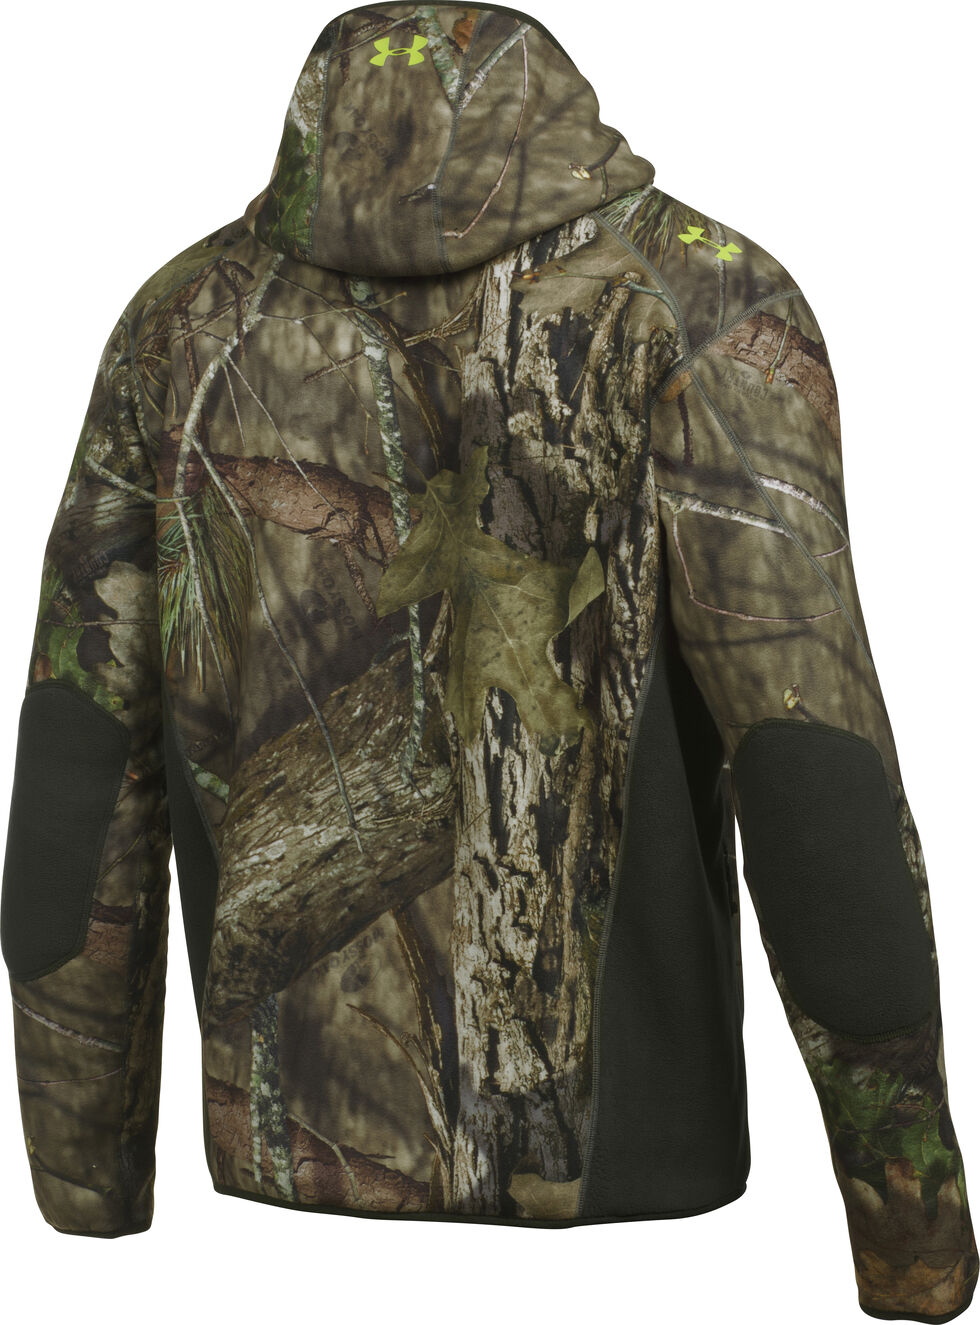 Under Armour Men's Stealth Hooded Jacket, Mossy Oak, hi-res